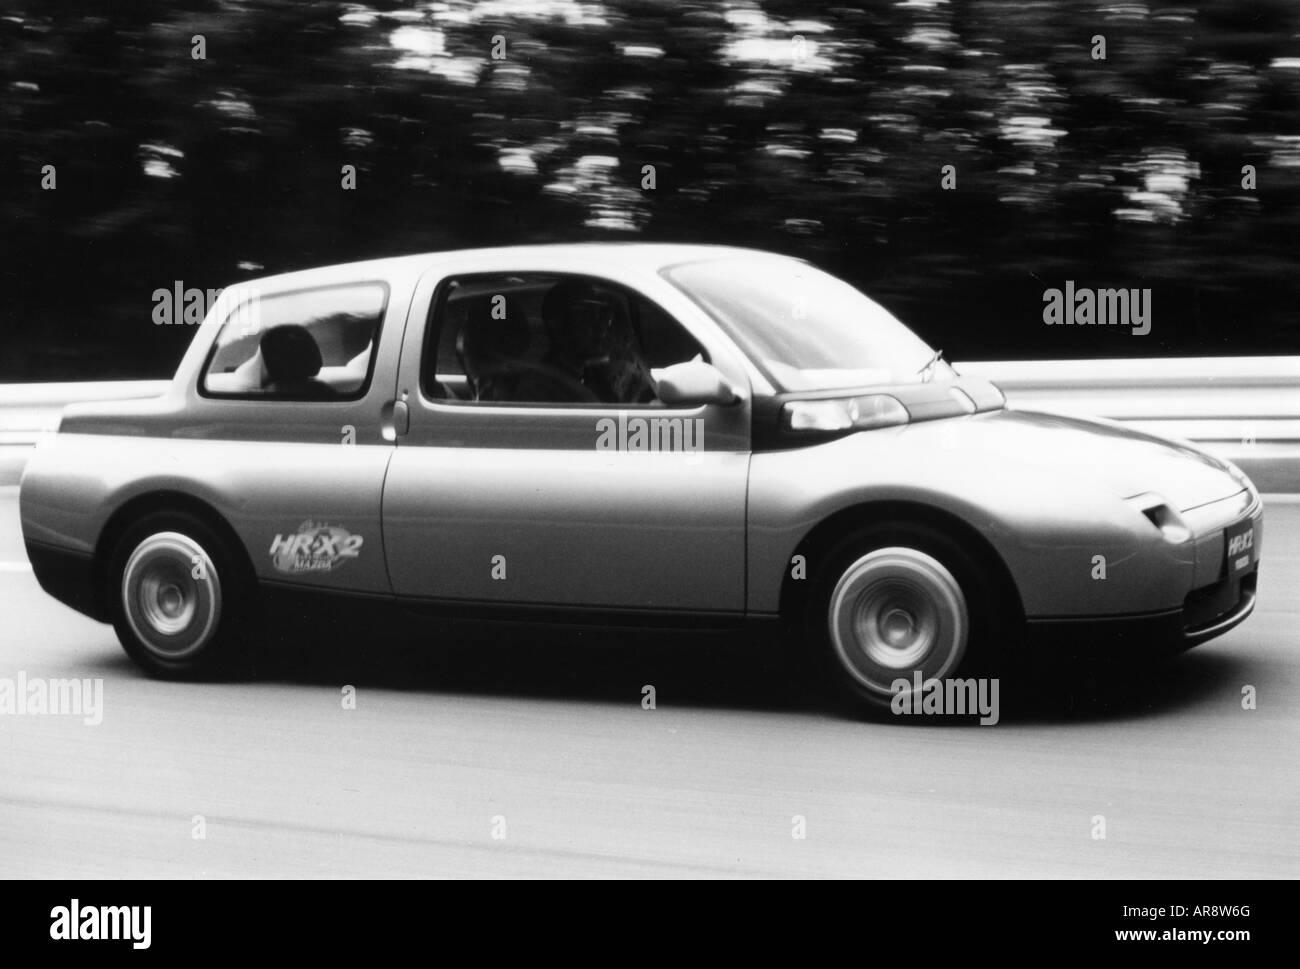 Verkehr / Transport, Auto, Fahrzeugvarianten, Mazda, Konzeptfahrzeug ...